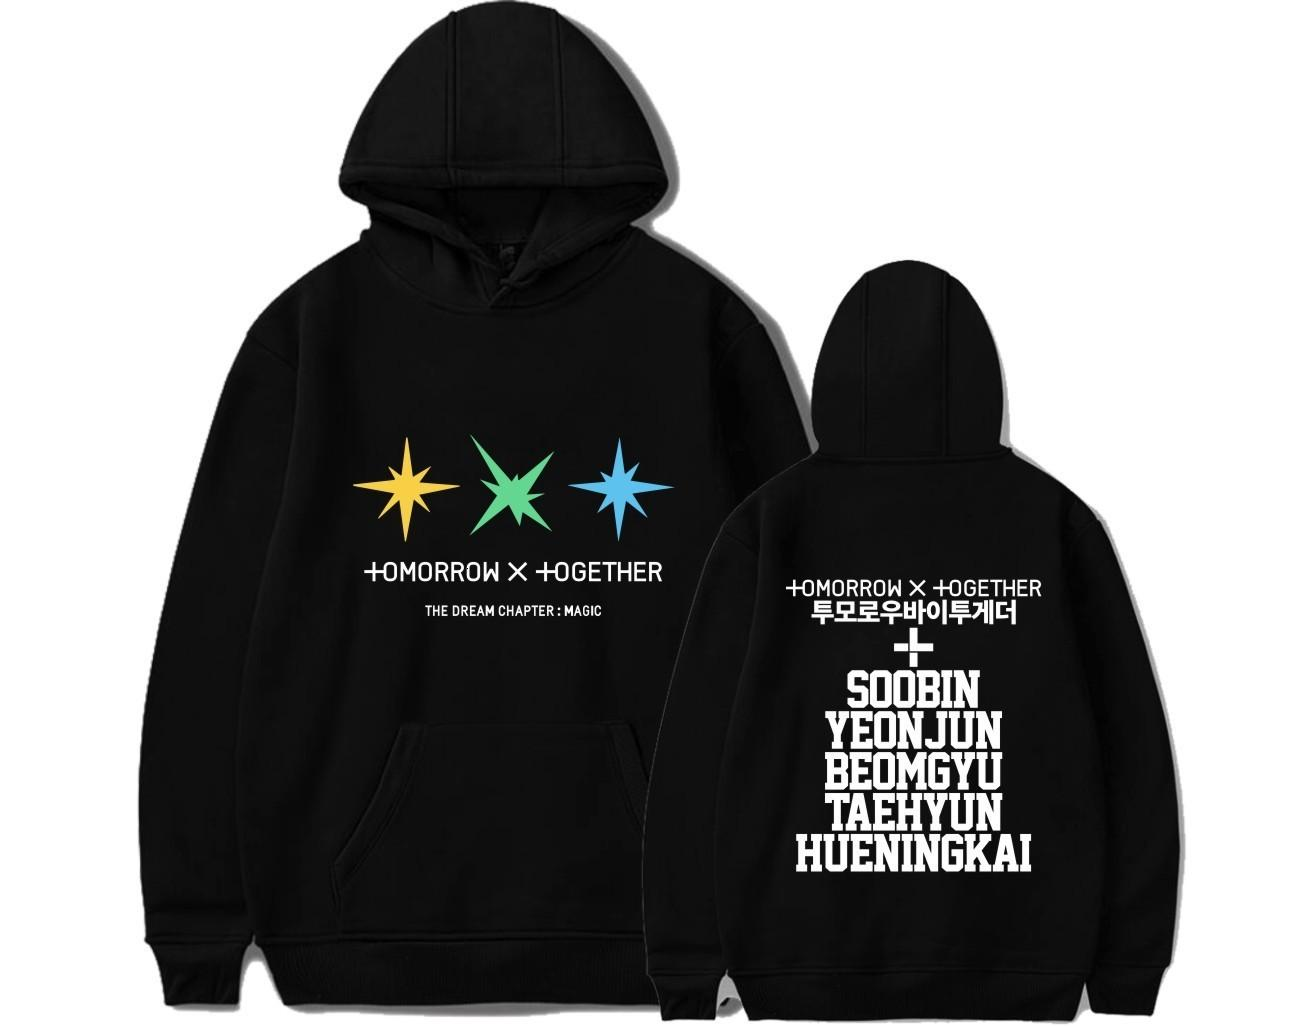 KPOP TXT Hoodies Sweatshirt Casual Oversized Hoodie Plus Size 4XL Merchandise TAEHYUN BEOMGYU Yeonjun TAEHYUN Y200610